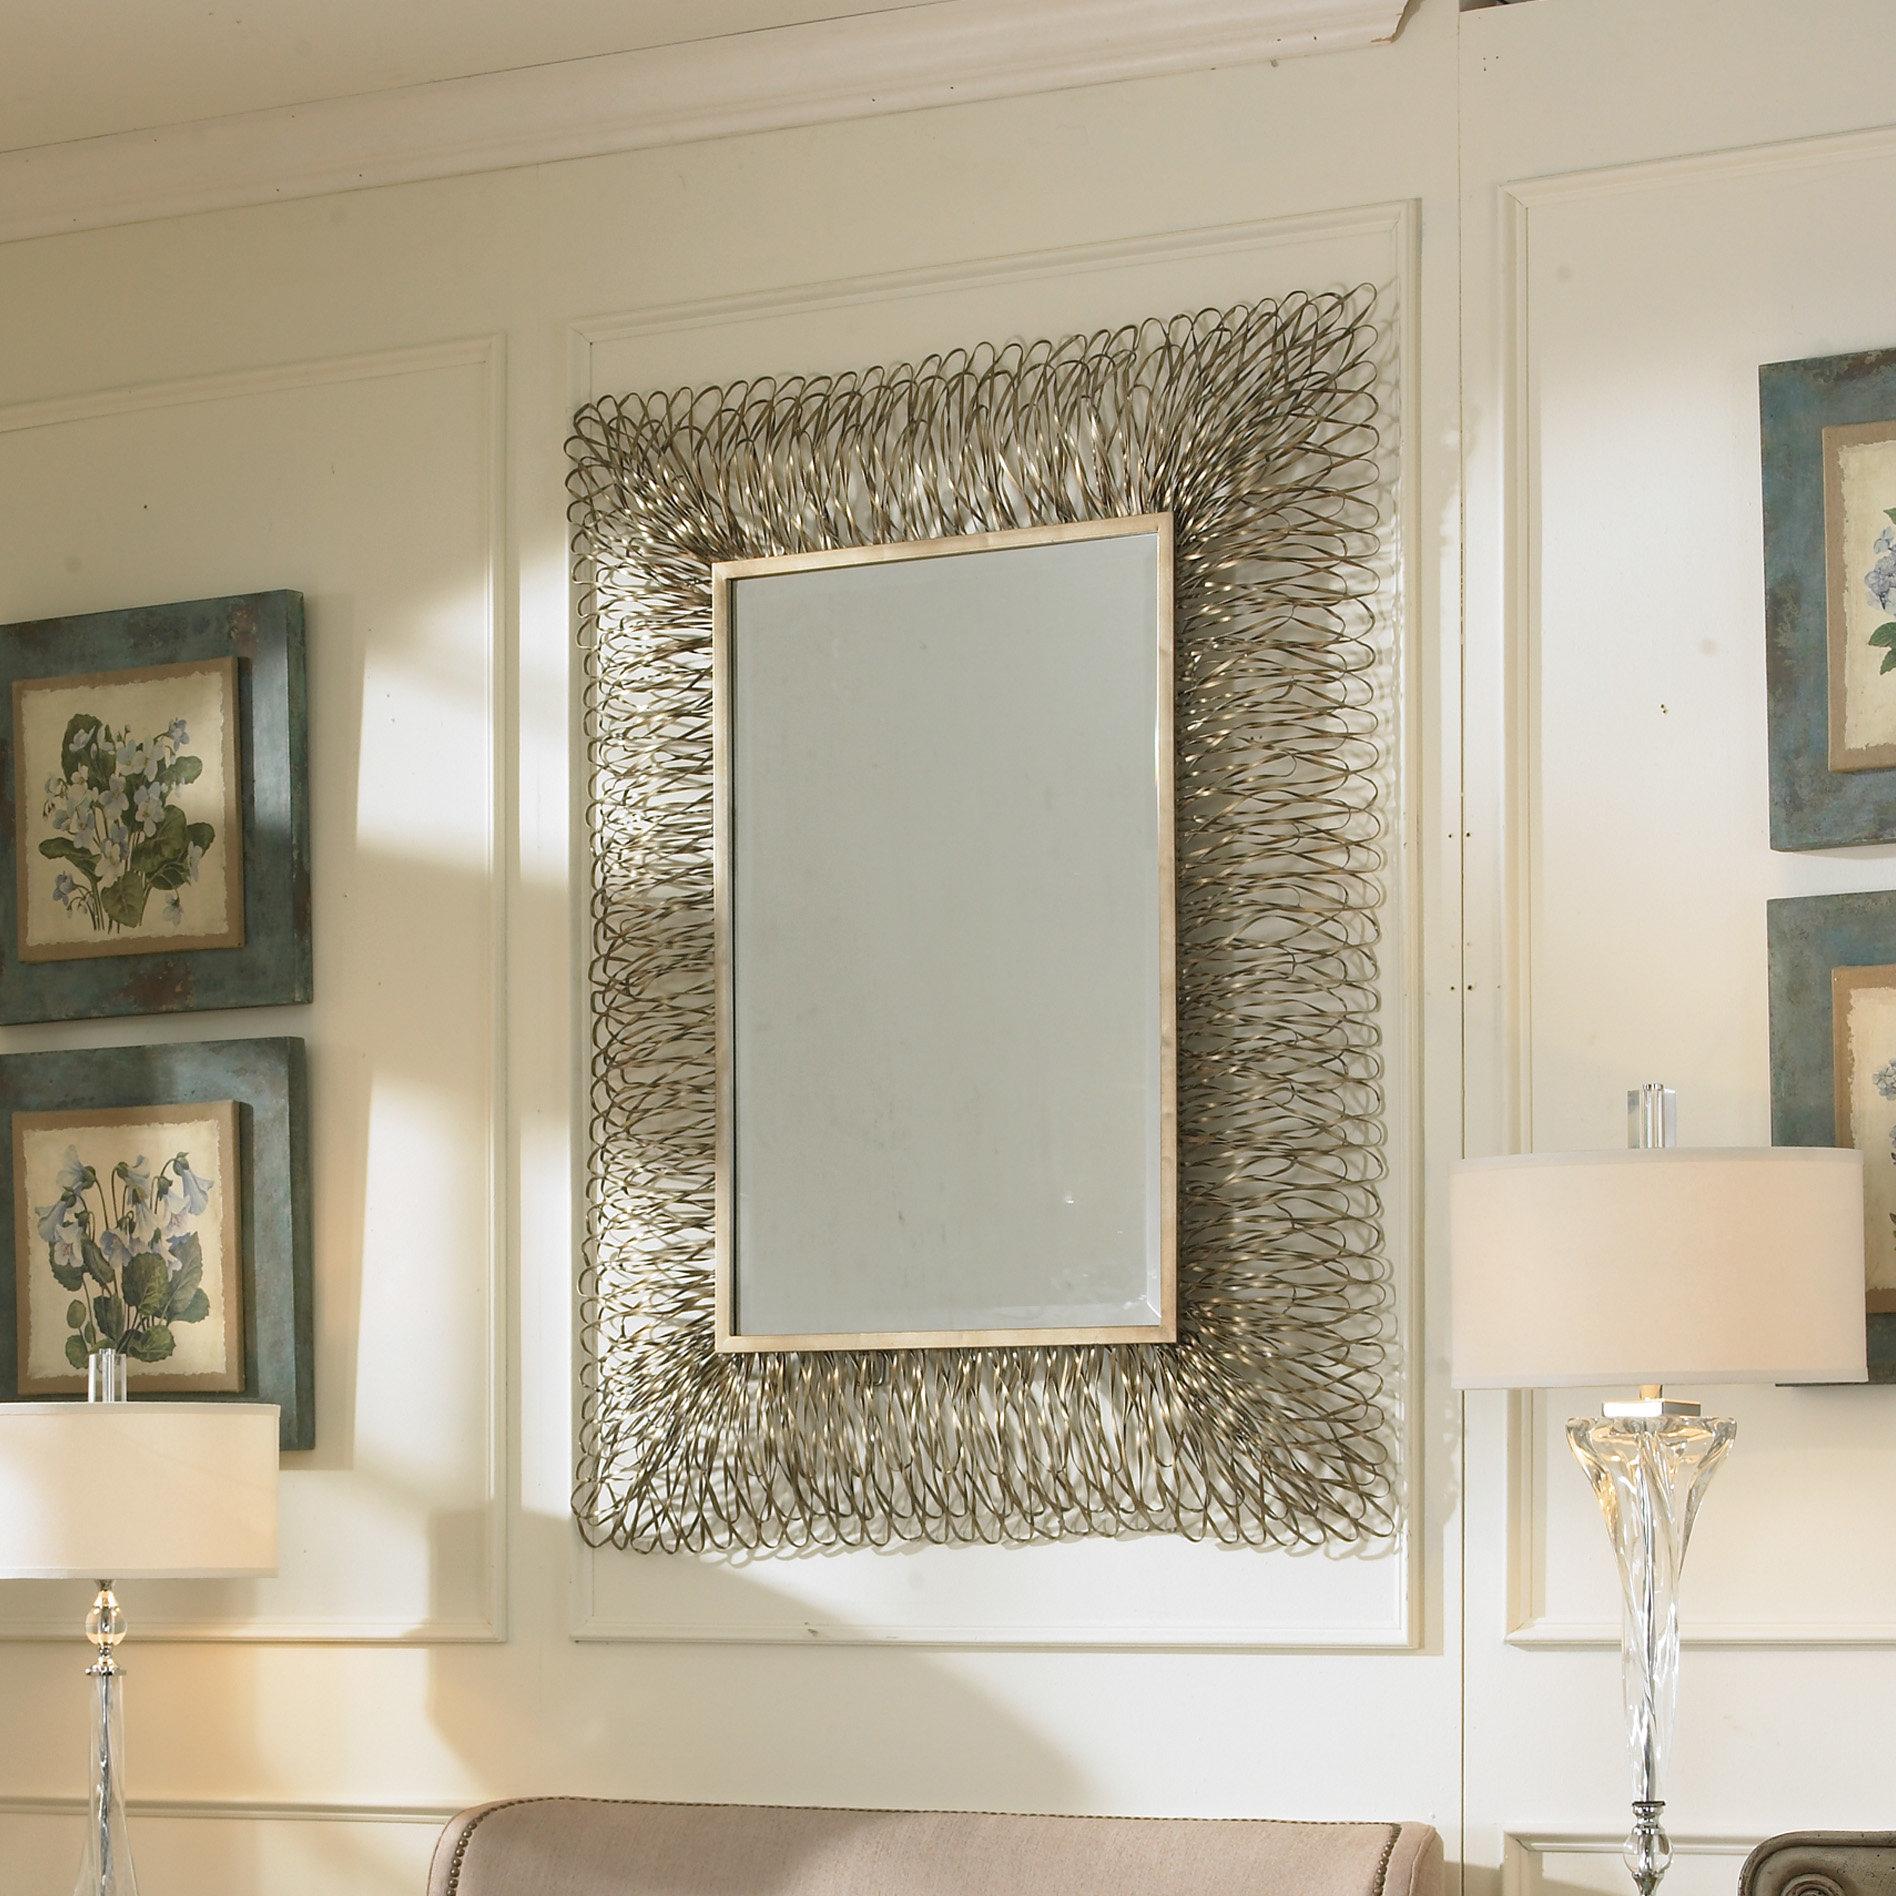 Decorative Wall Mirrors Tiles | Wayfair Inside Bem Decorative Wall Mirrors (View 15 of 30)